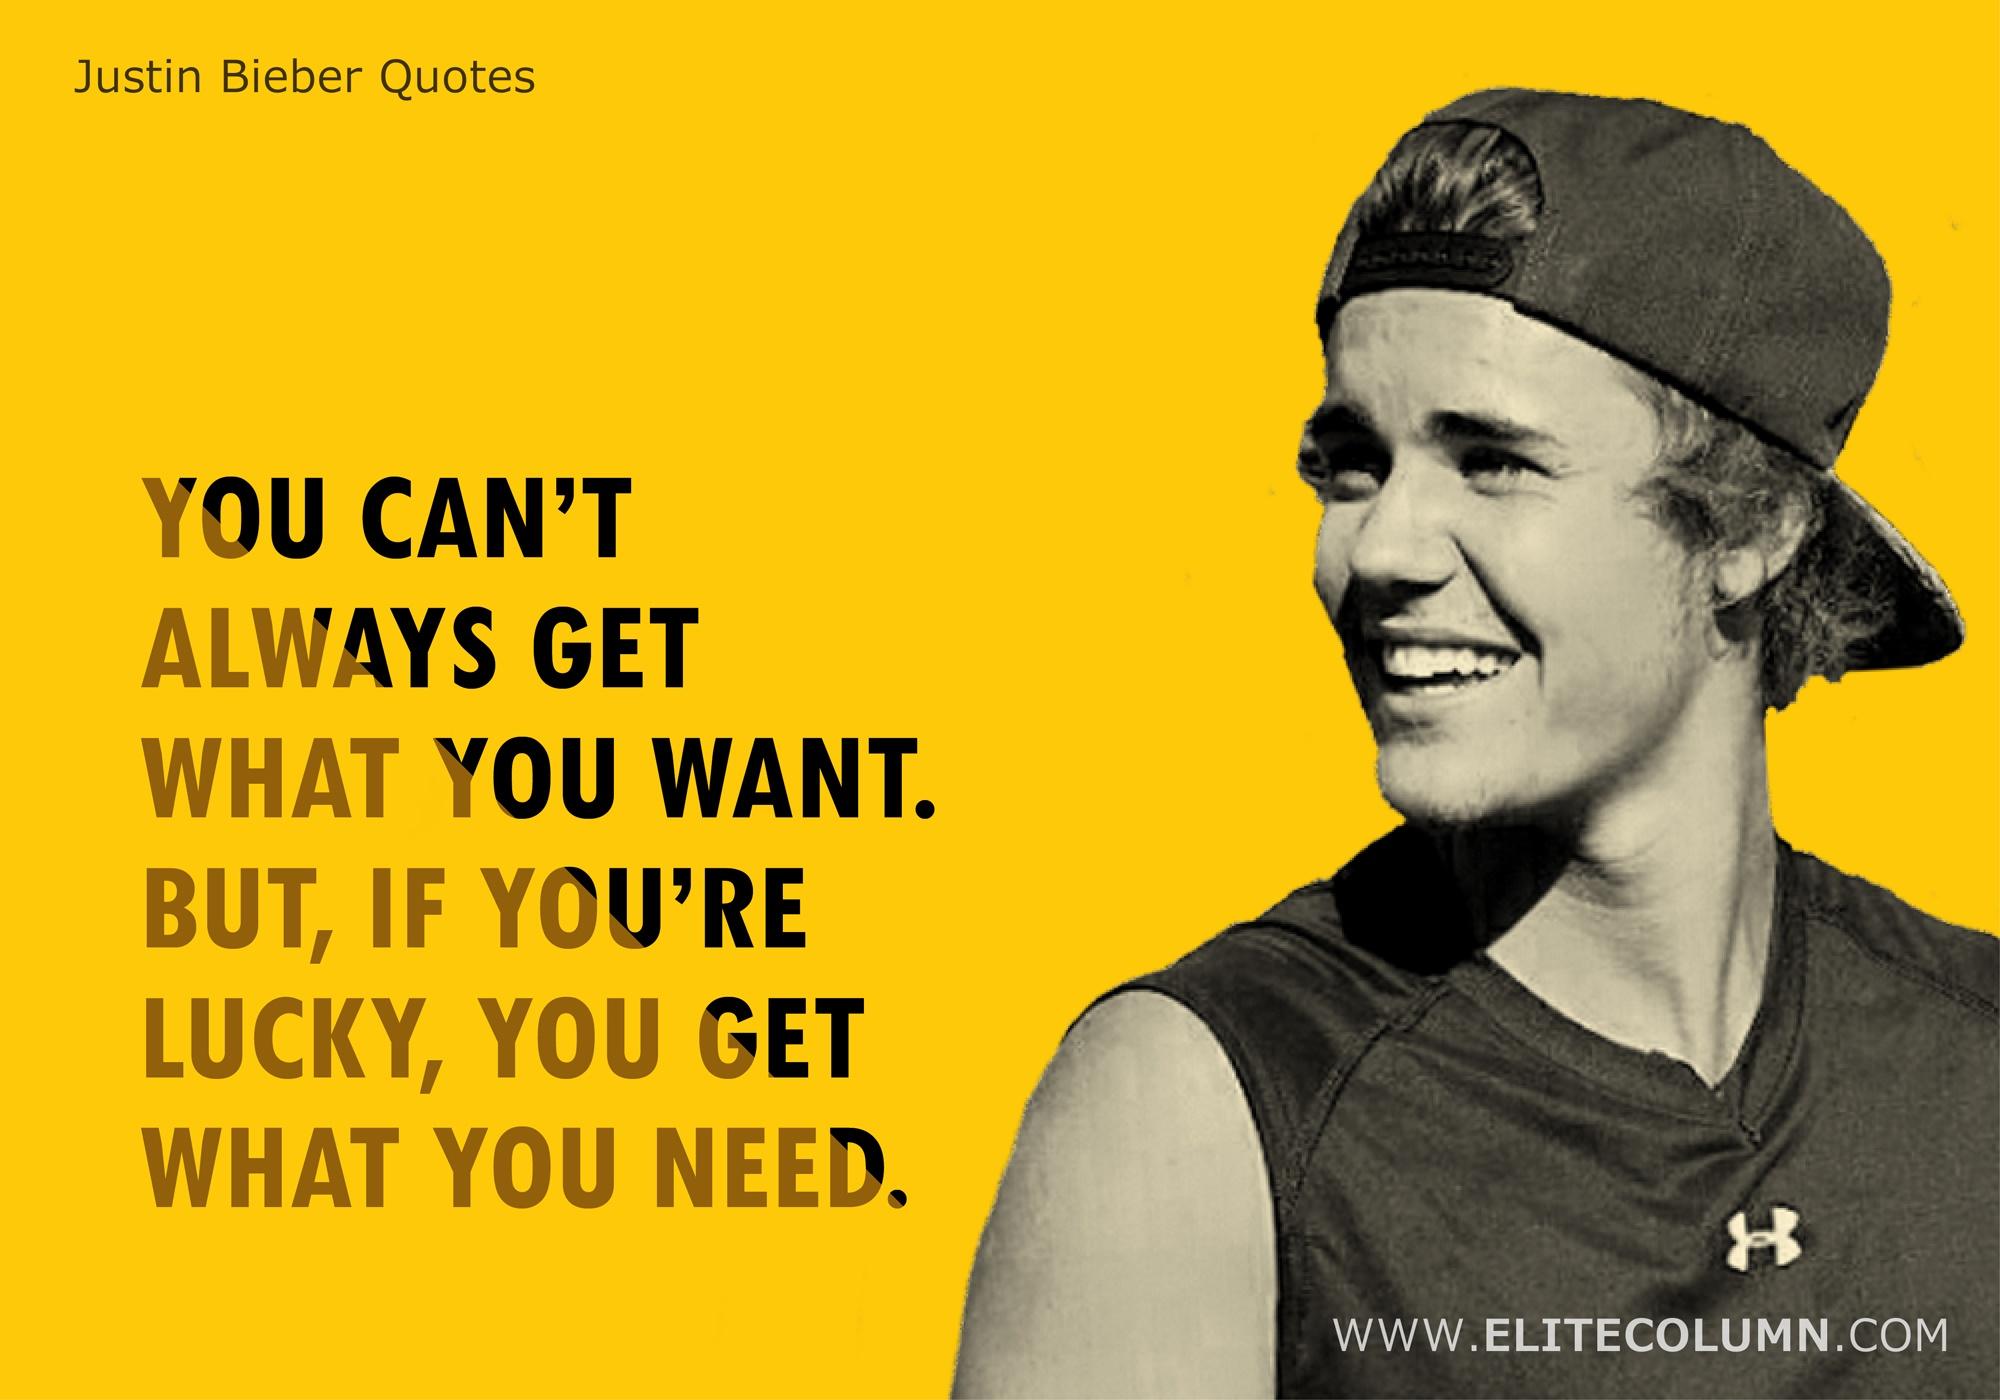 Justin Bieber Quotes (12)